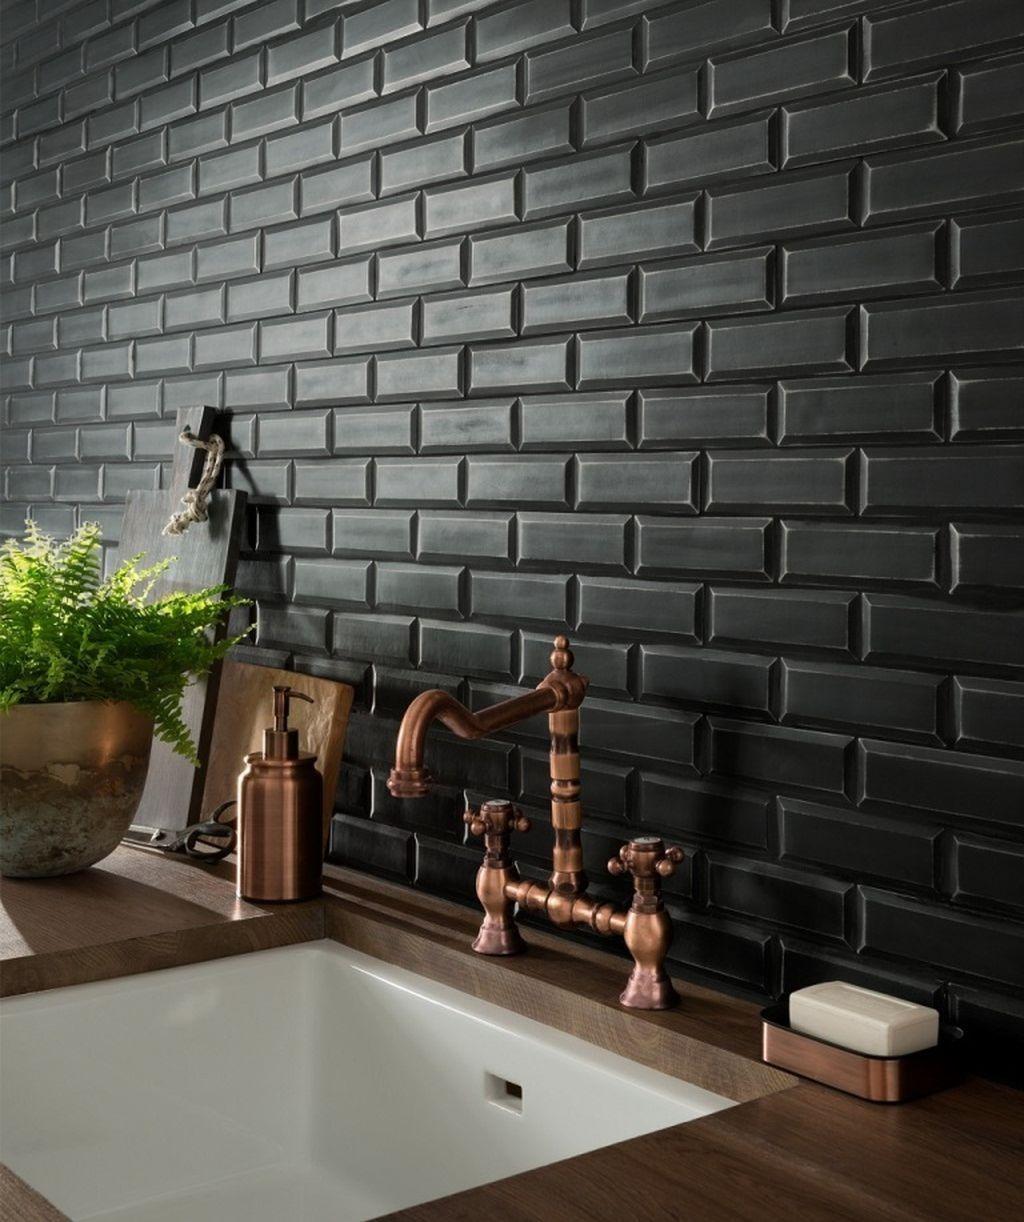 Cool 37 Awesome Kitchen Design Ideas For 2019 Kitchen Design Trends Kitchen Wall Tiles Design Black Tiles Kitchen